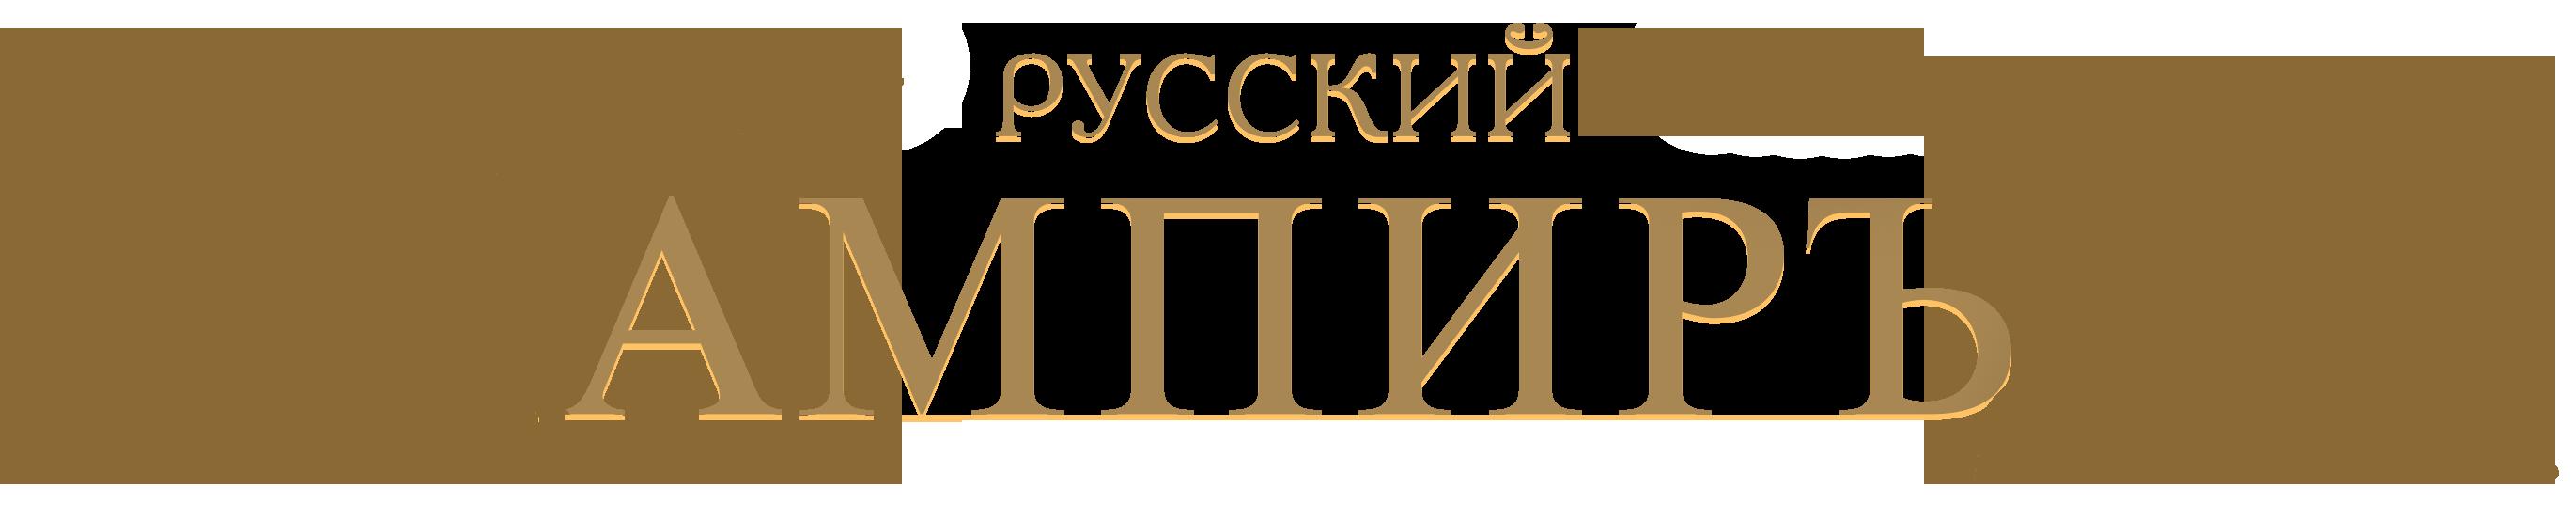 "Restaurant ""Russian Ampir"""